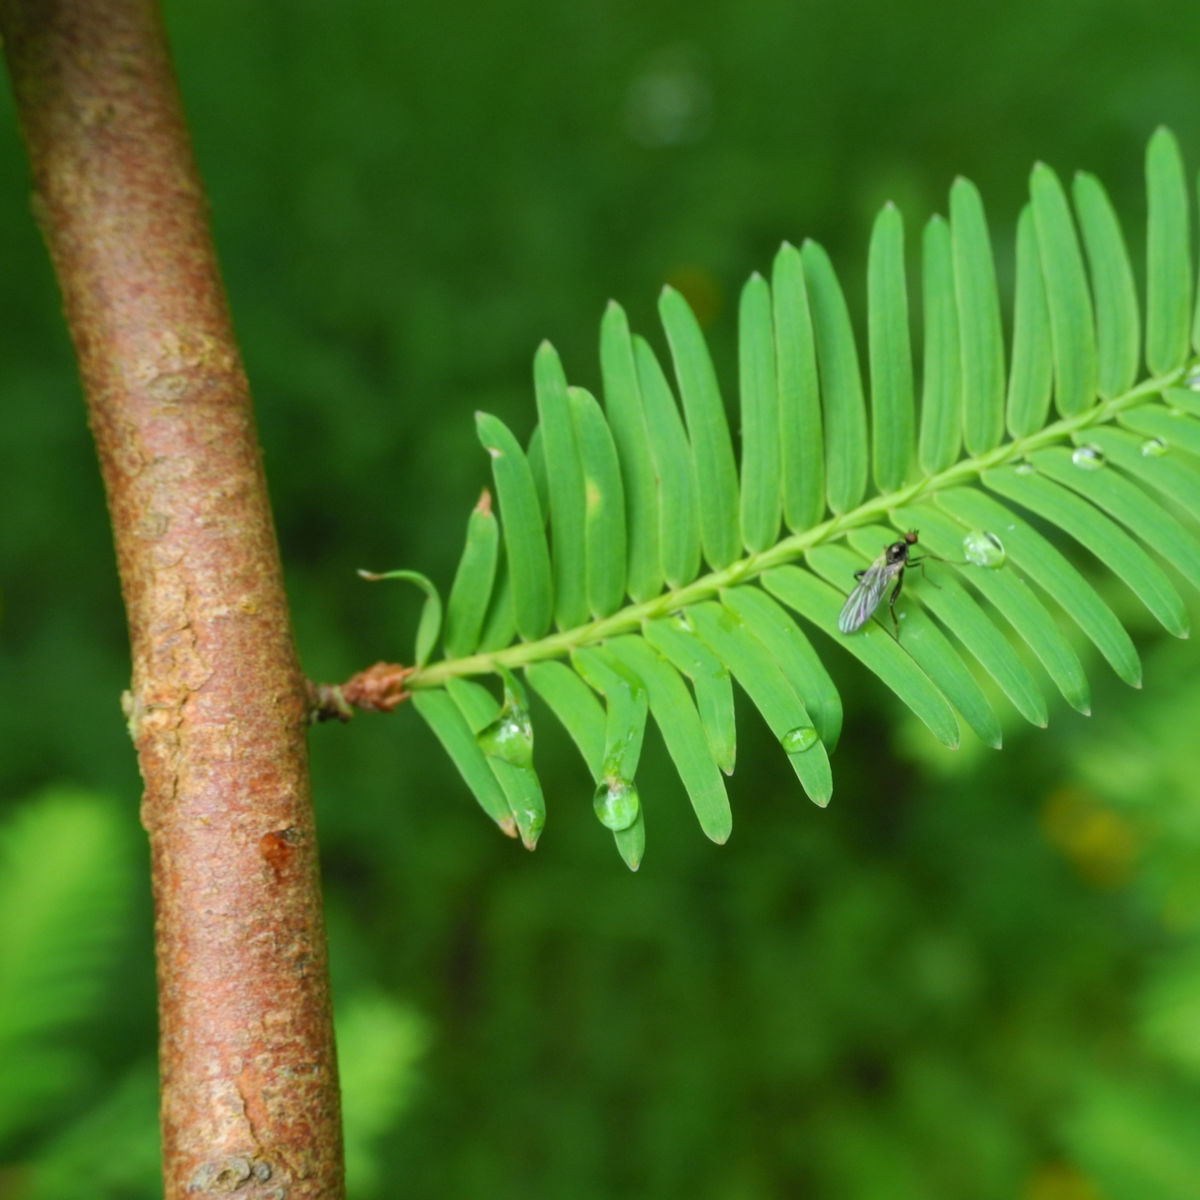 Urweltmammutbaum Nadel gruen Metasequoia glyptostroboides